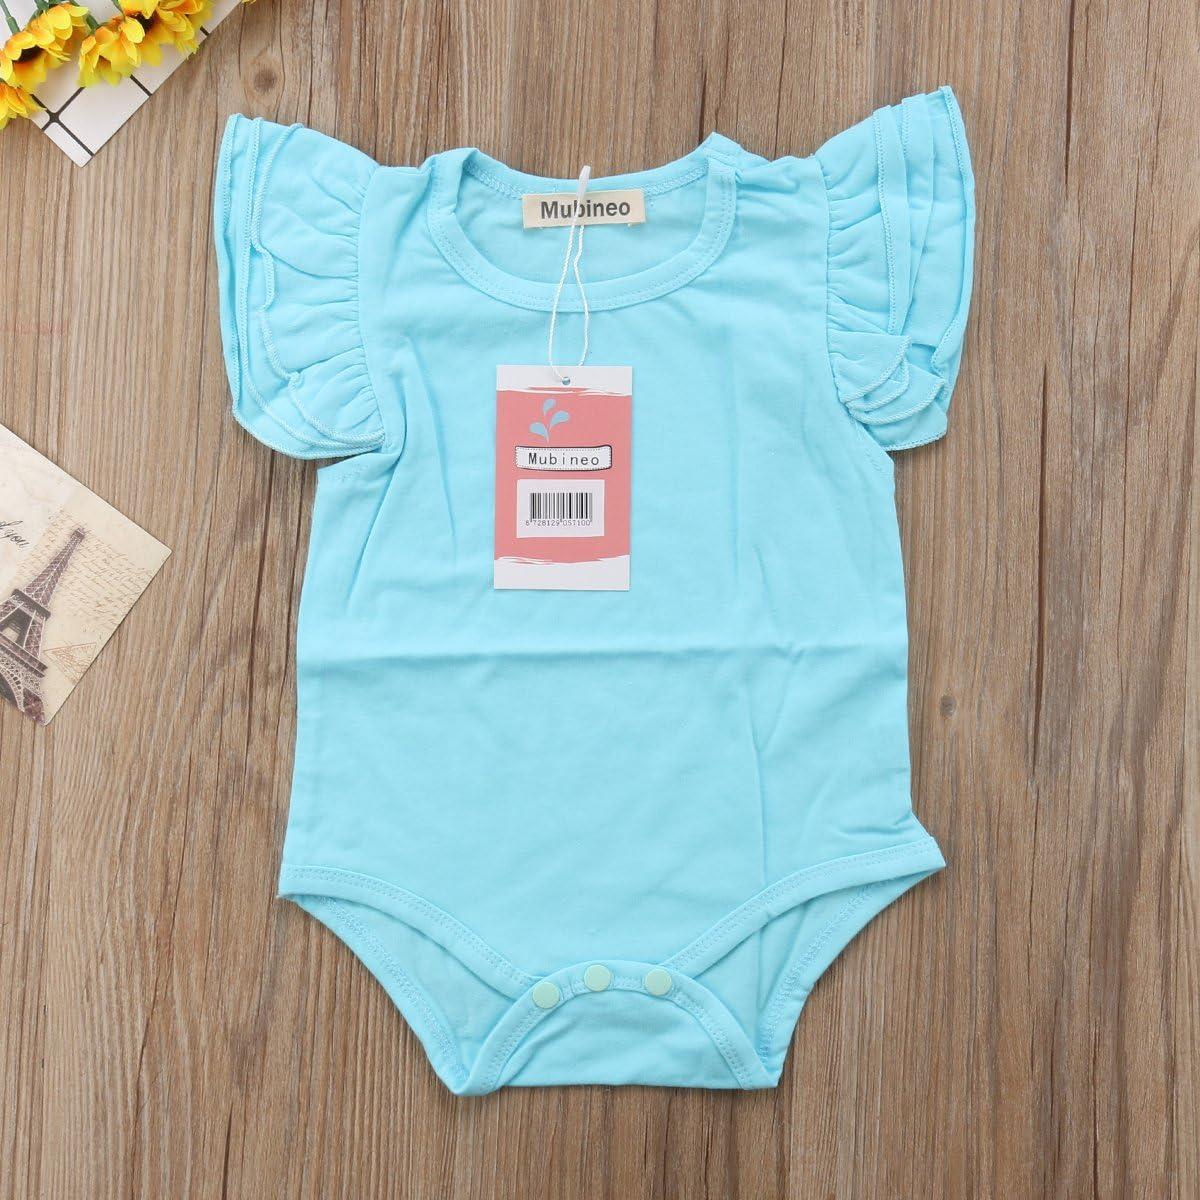 Infant Baby Girl Basic Ruffle Short Sleeve Cotton Romper Bodysuit Tops Clothes